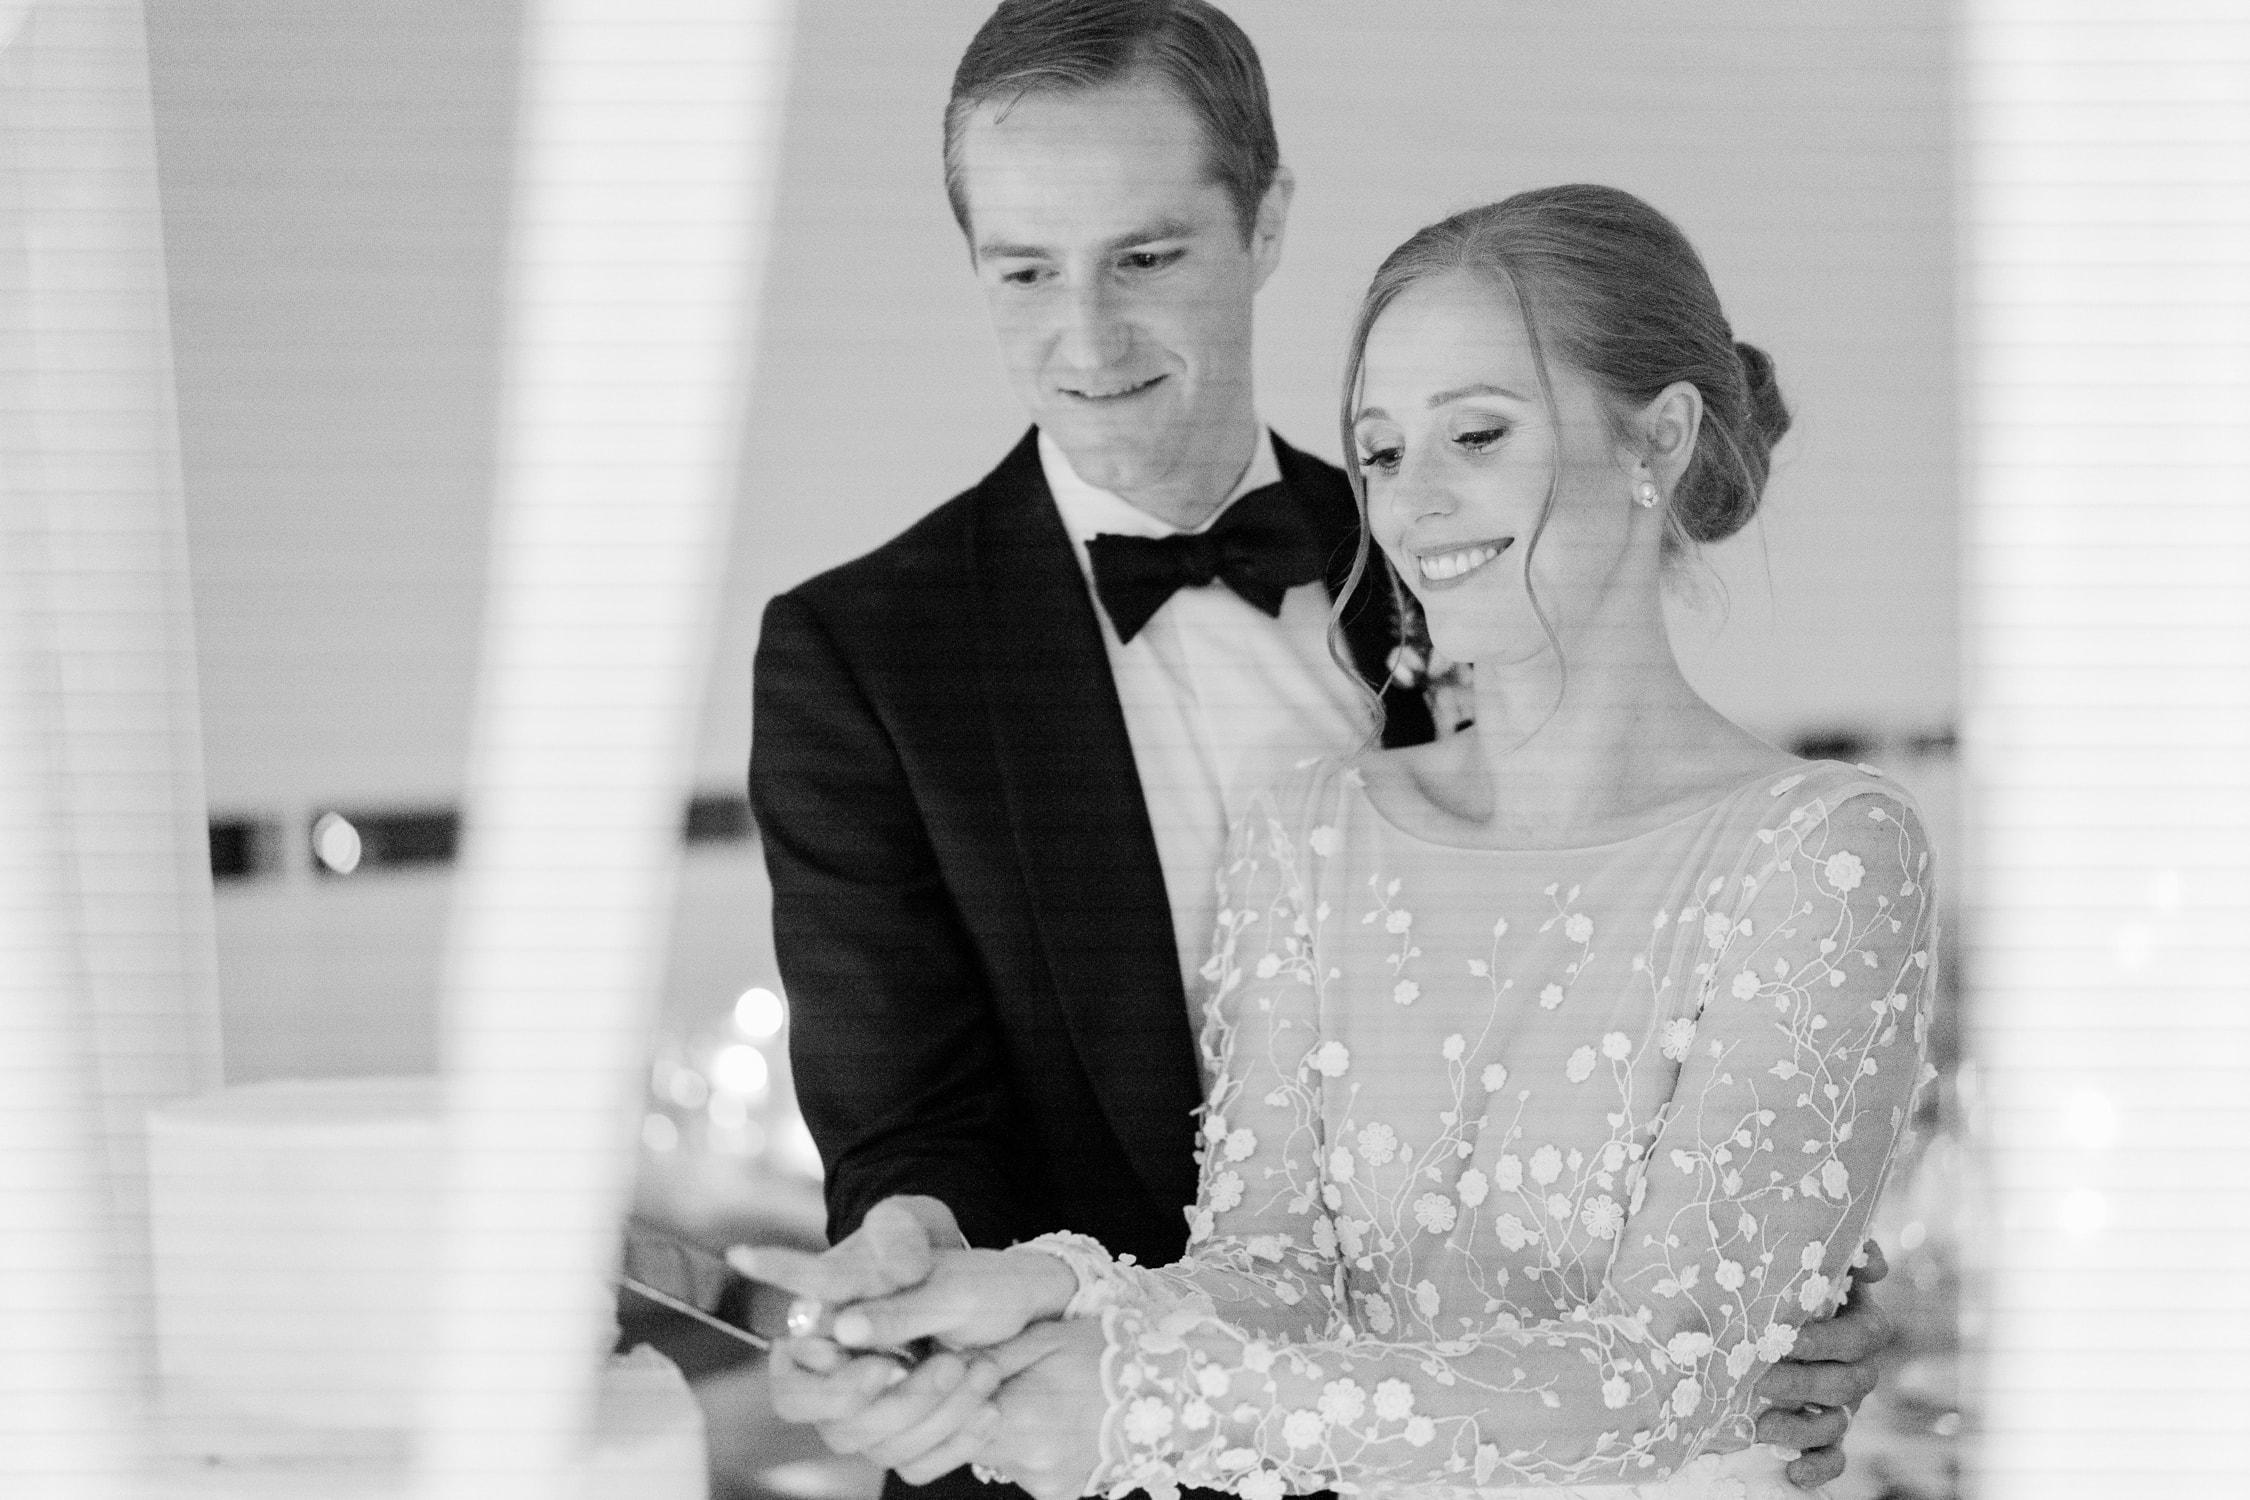 PROSPECT_HOUSE_WEDDING_AUSTIN_TX_MATTHEW_MOORE-00998.jpg